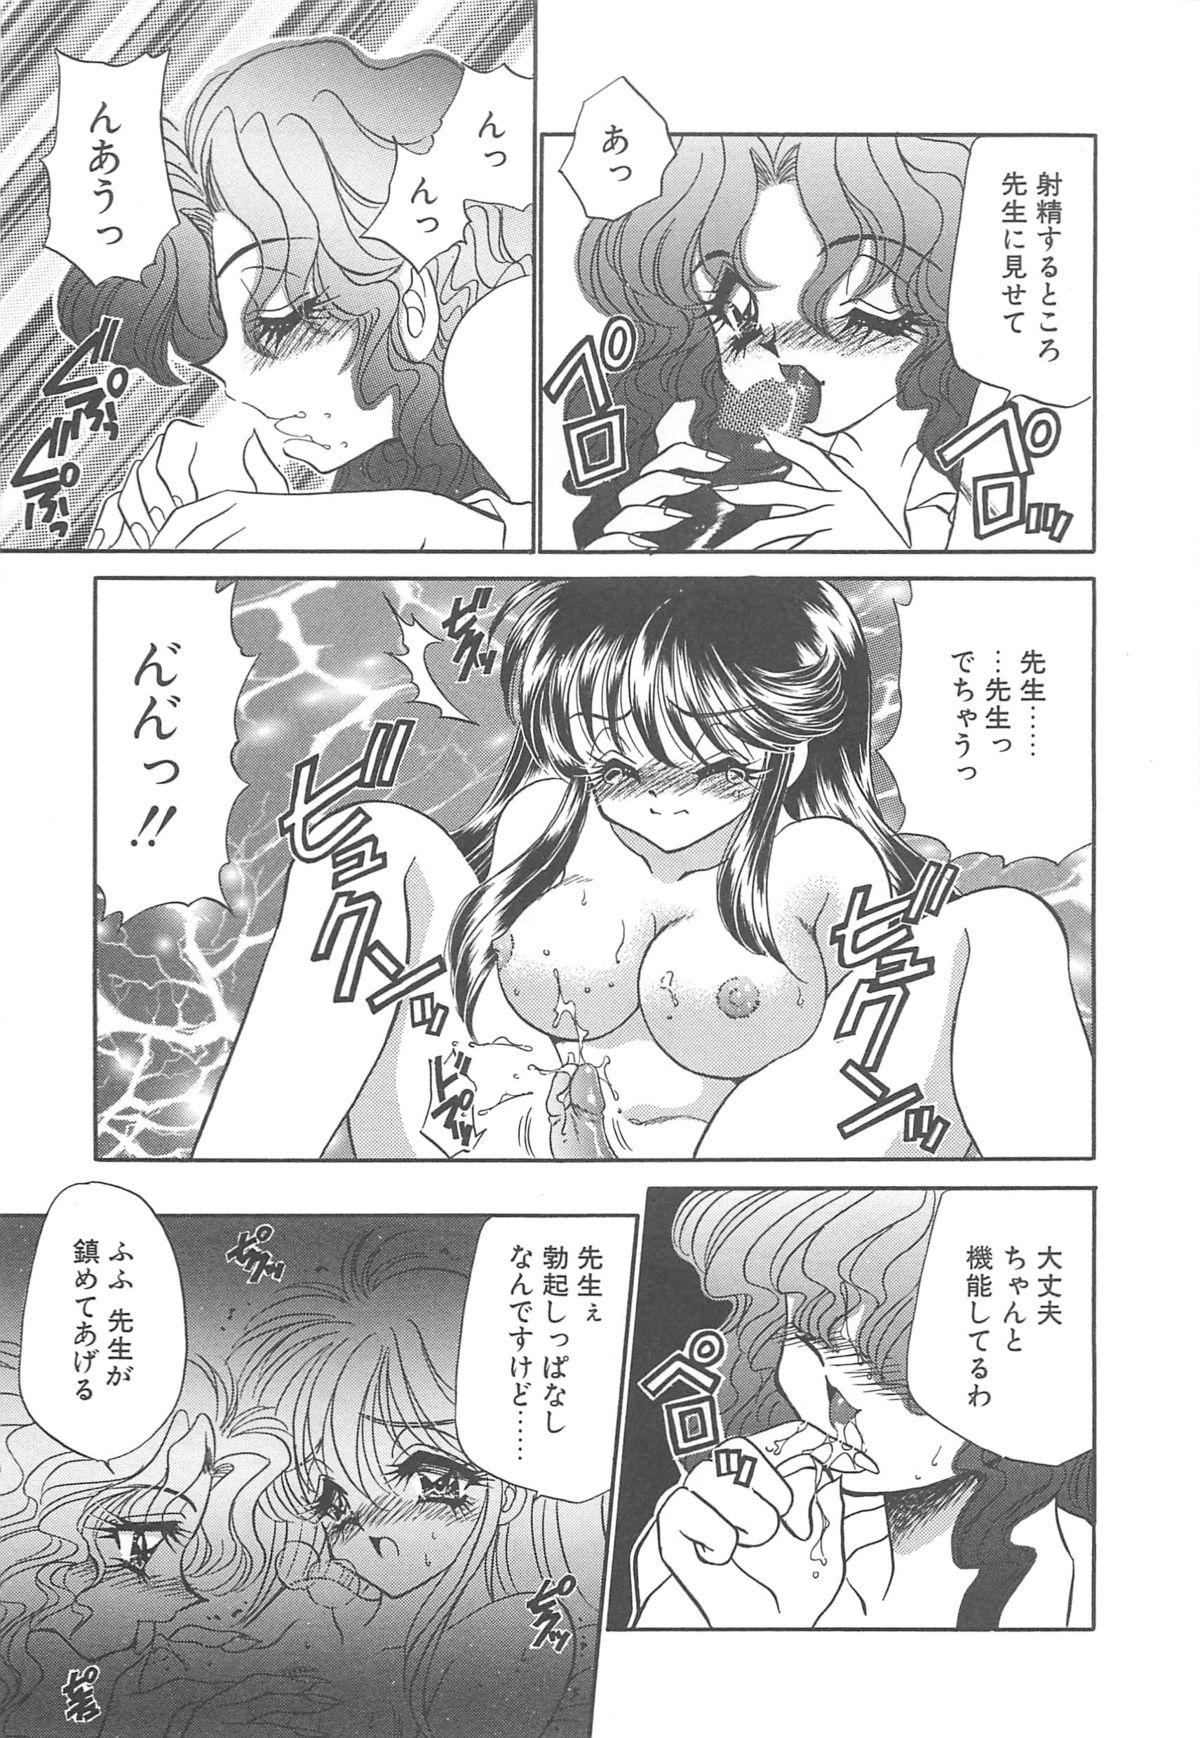 Kigurumi Sentai Quiltian 81